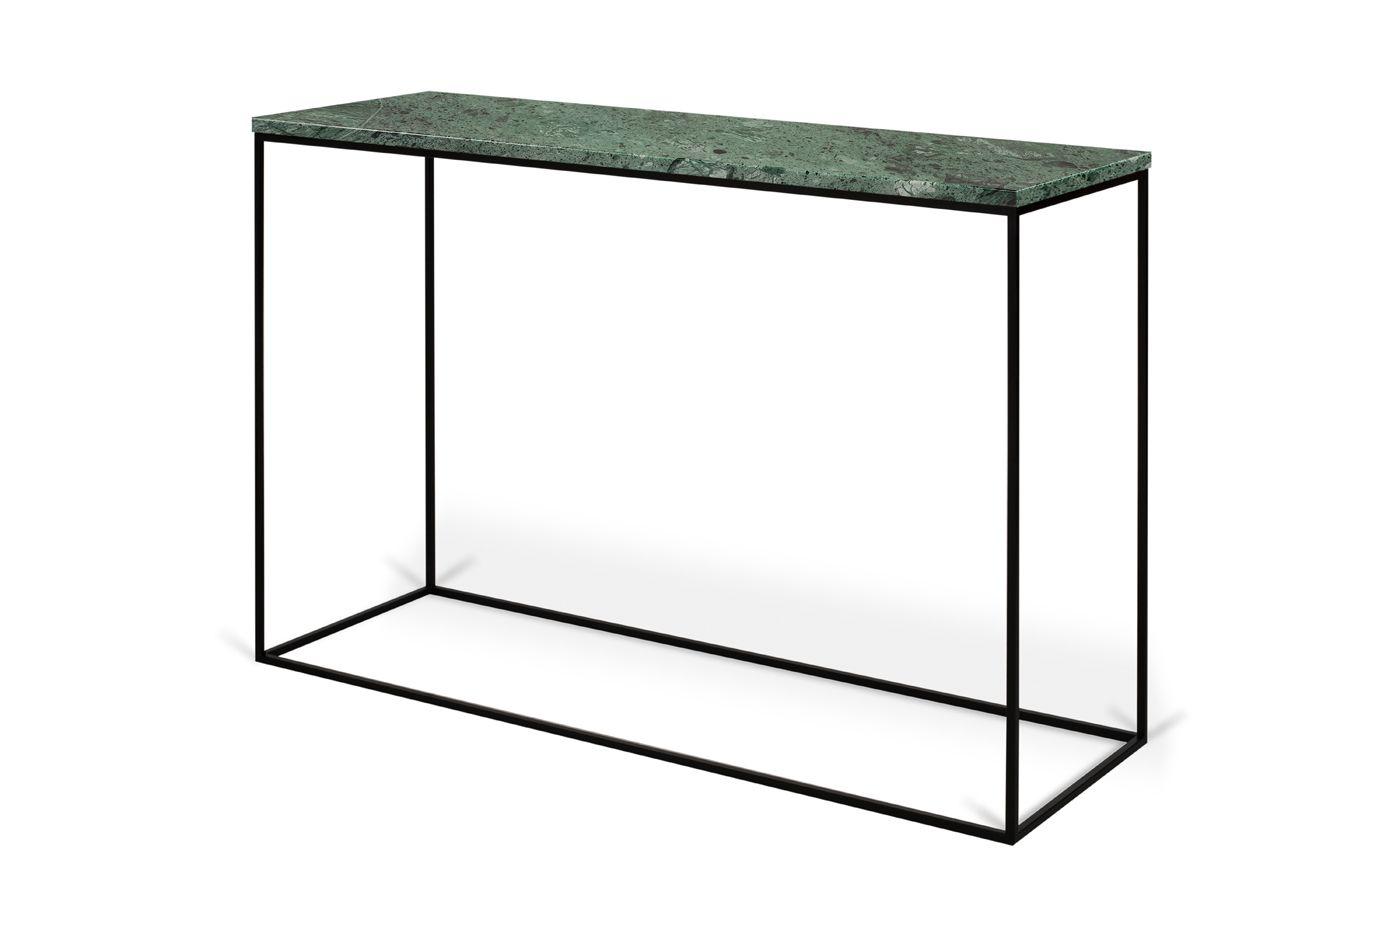 Temahome Gleam Konsolbord - Grøn marmor